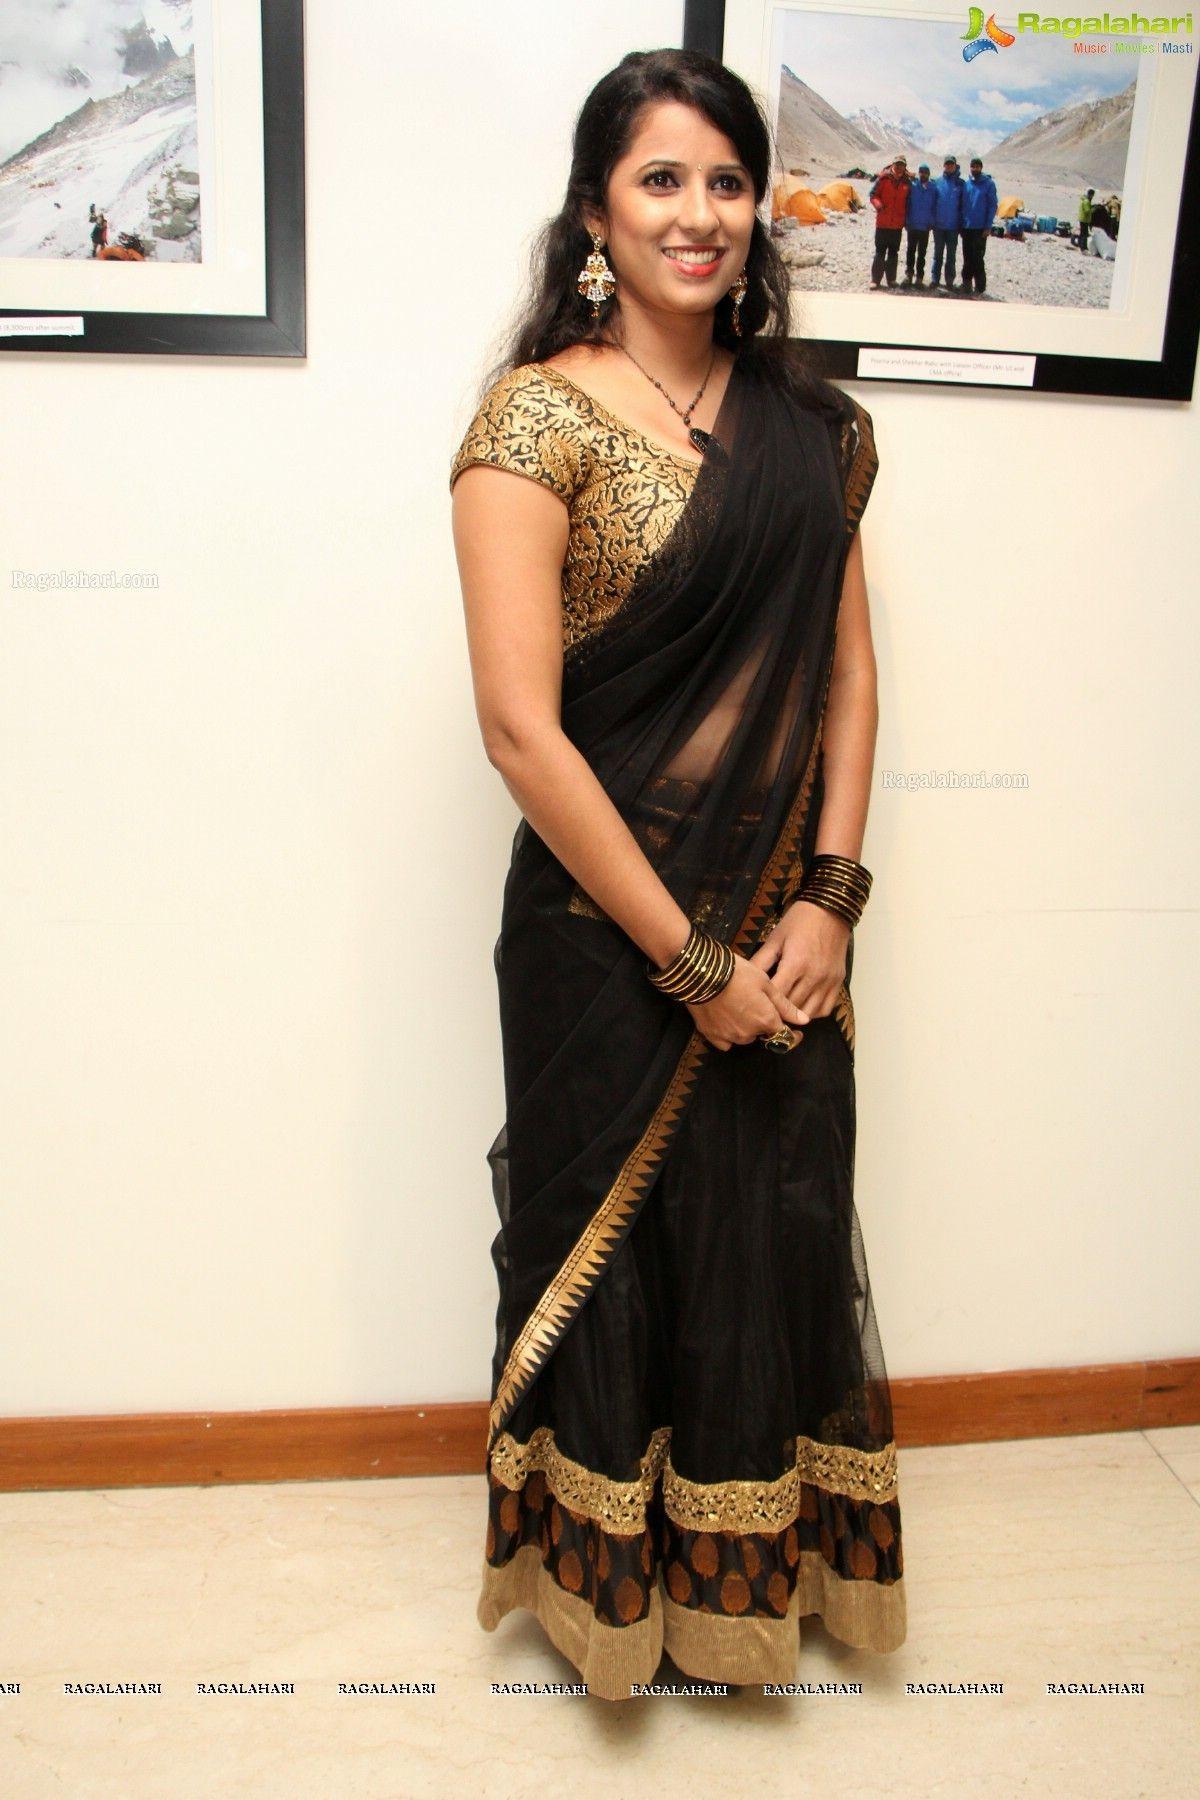 Shravya reddy | Black saree, Clothes for women, Saree